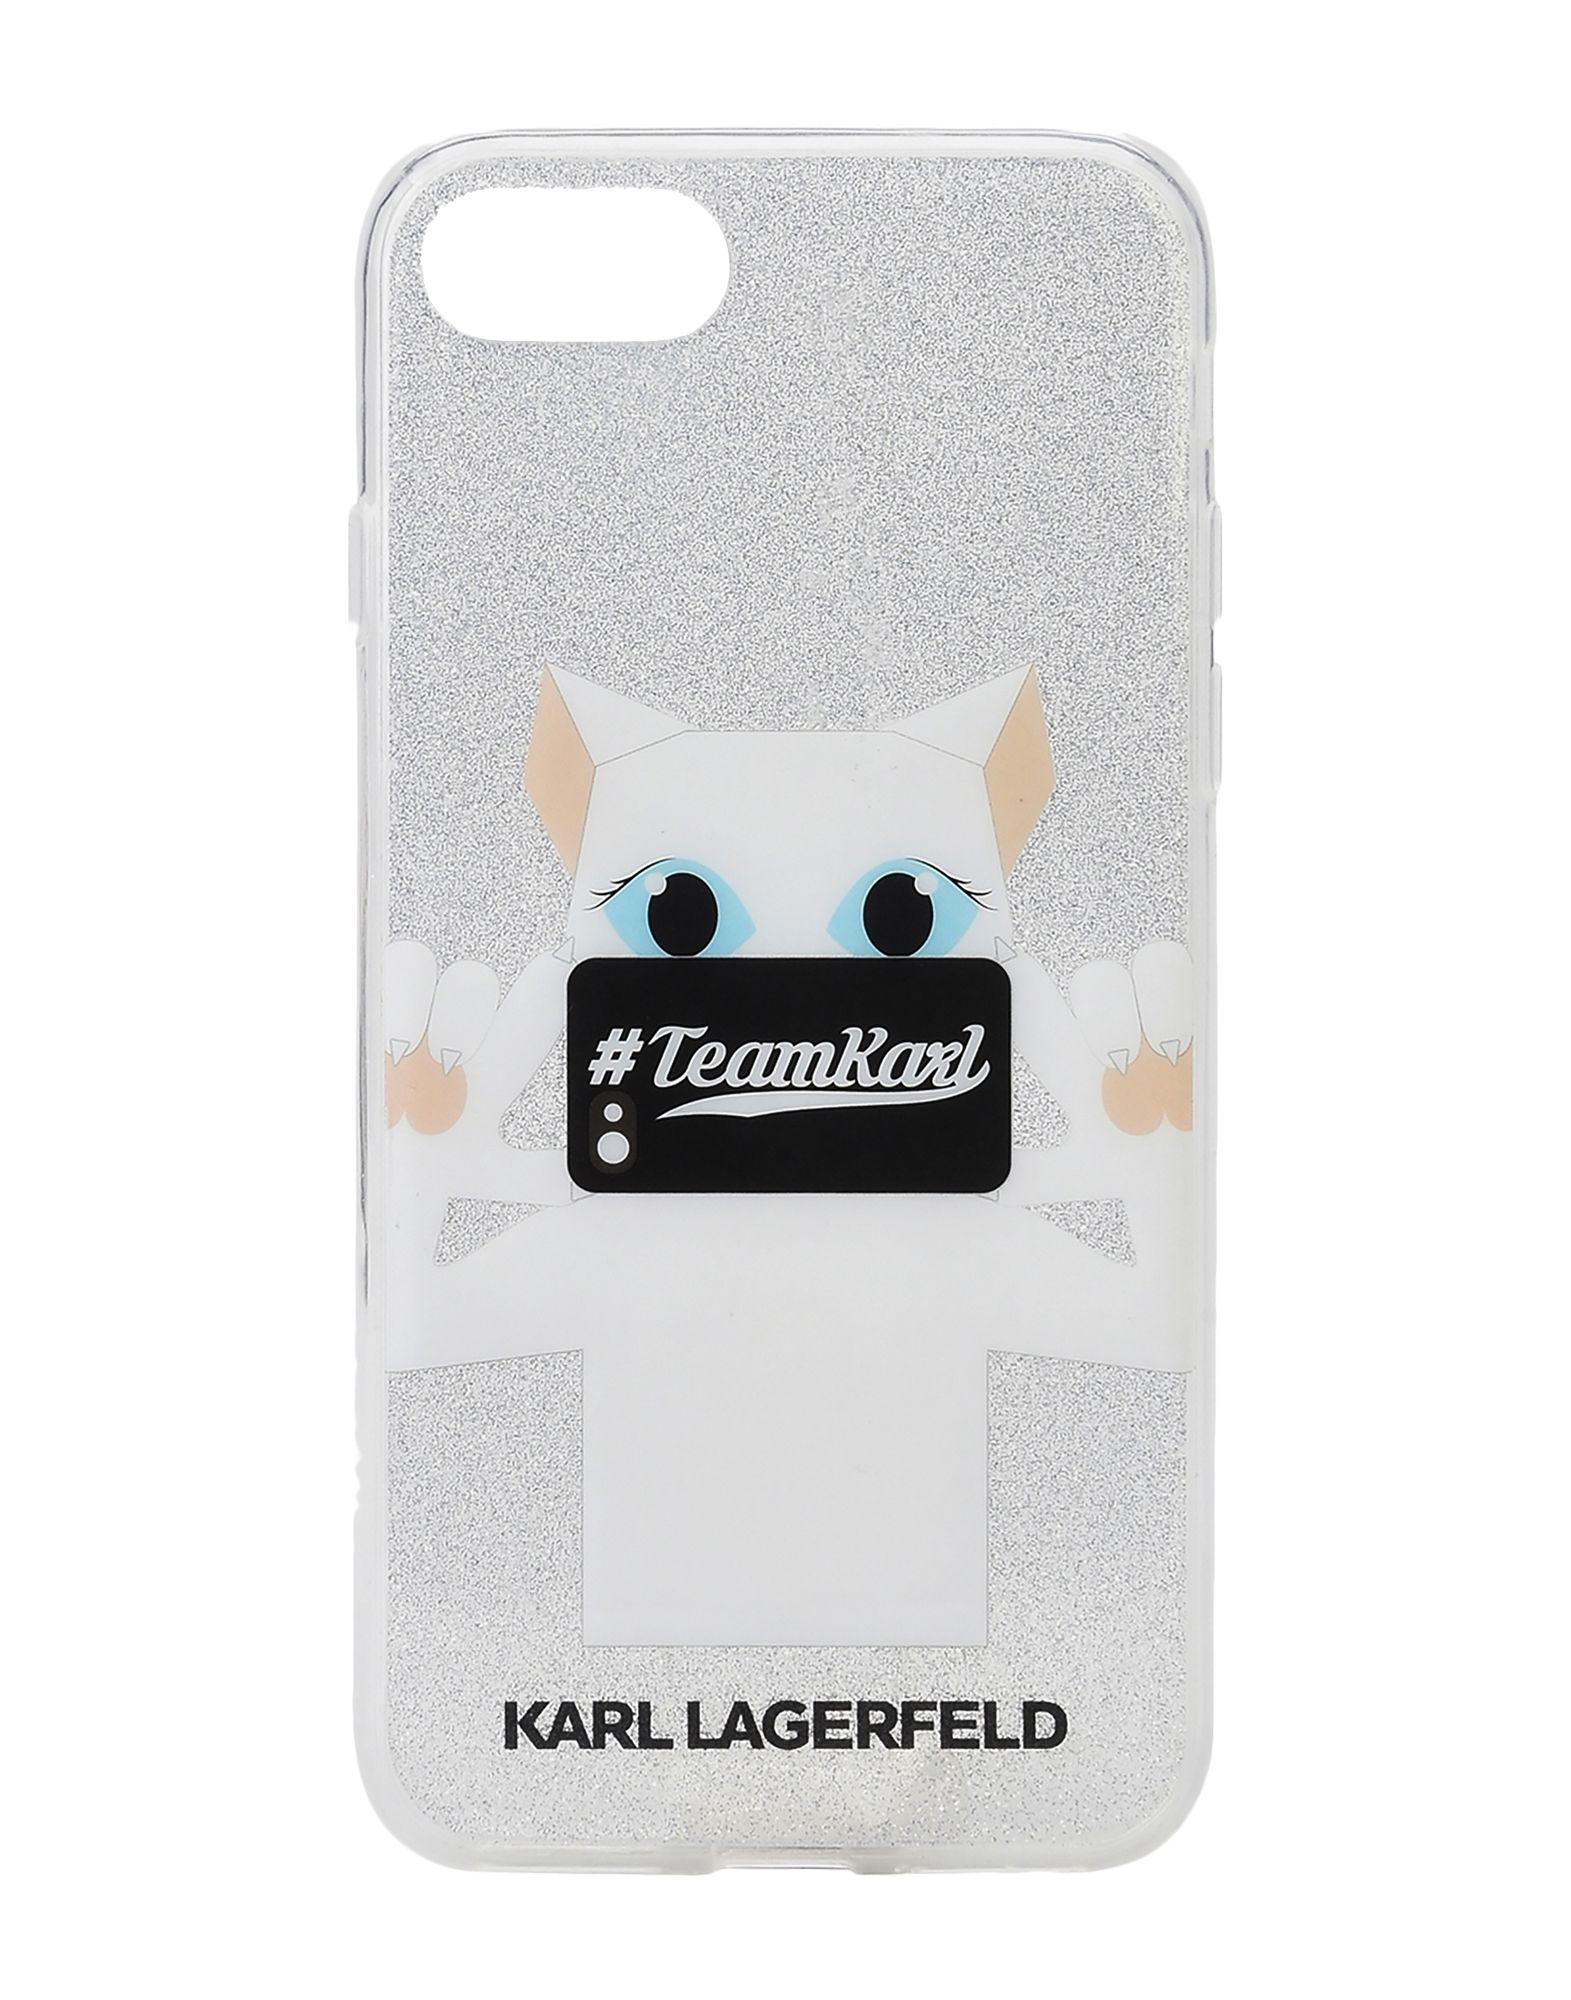 KARL LAGERFELD Чехол karl lagerfeld чехол крышка karl lagerfeld для apple iphone 6 6s силикон голубой soft case